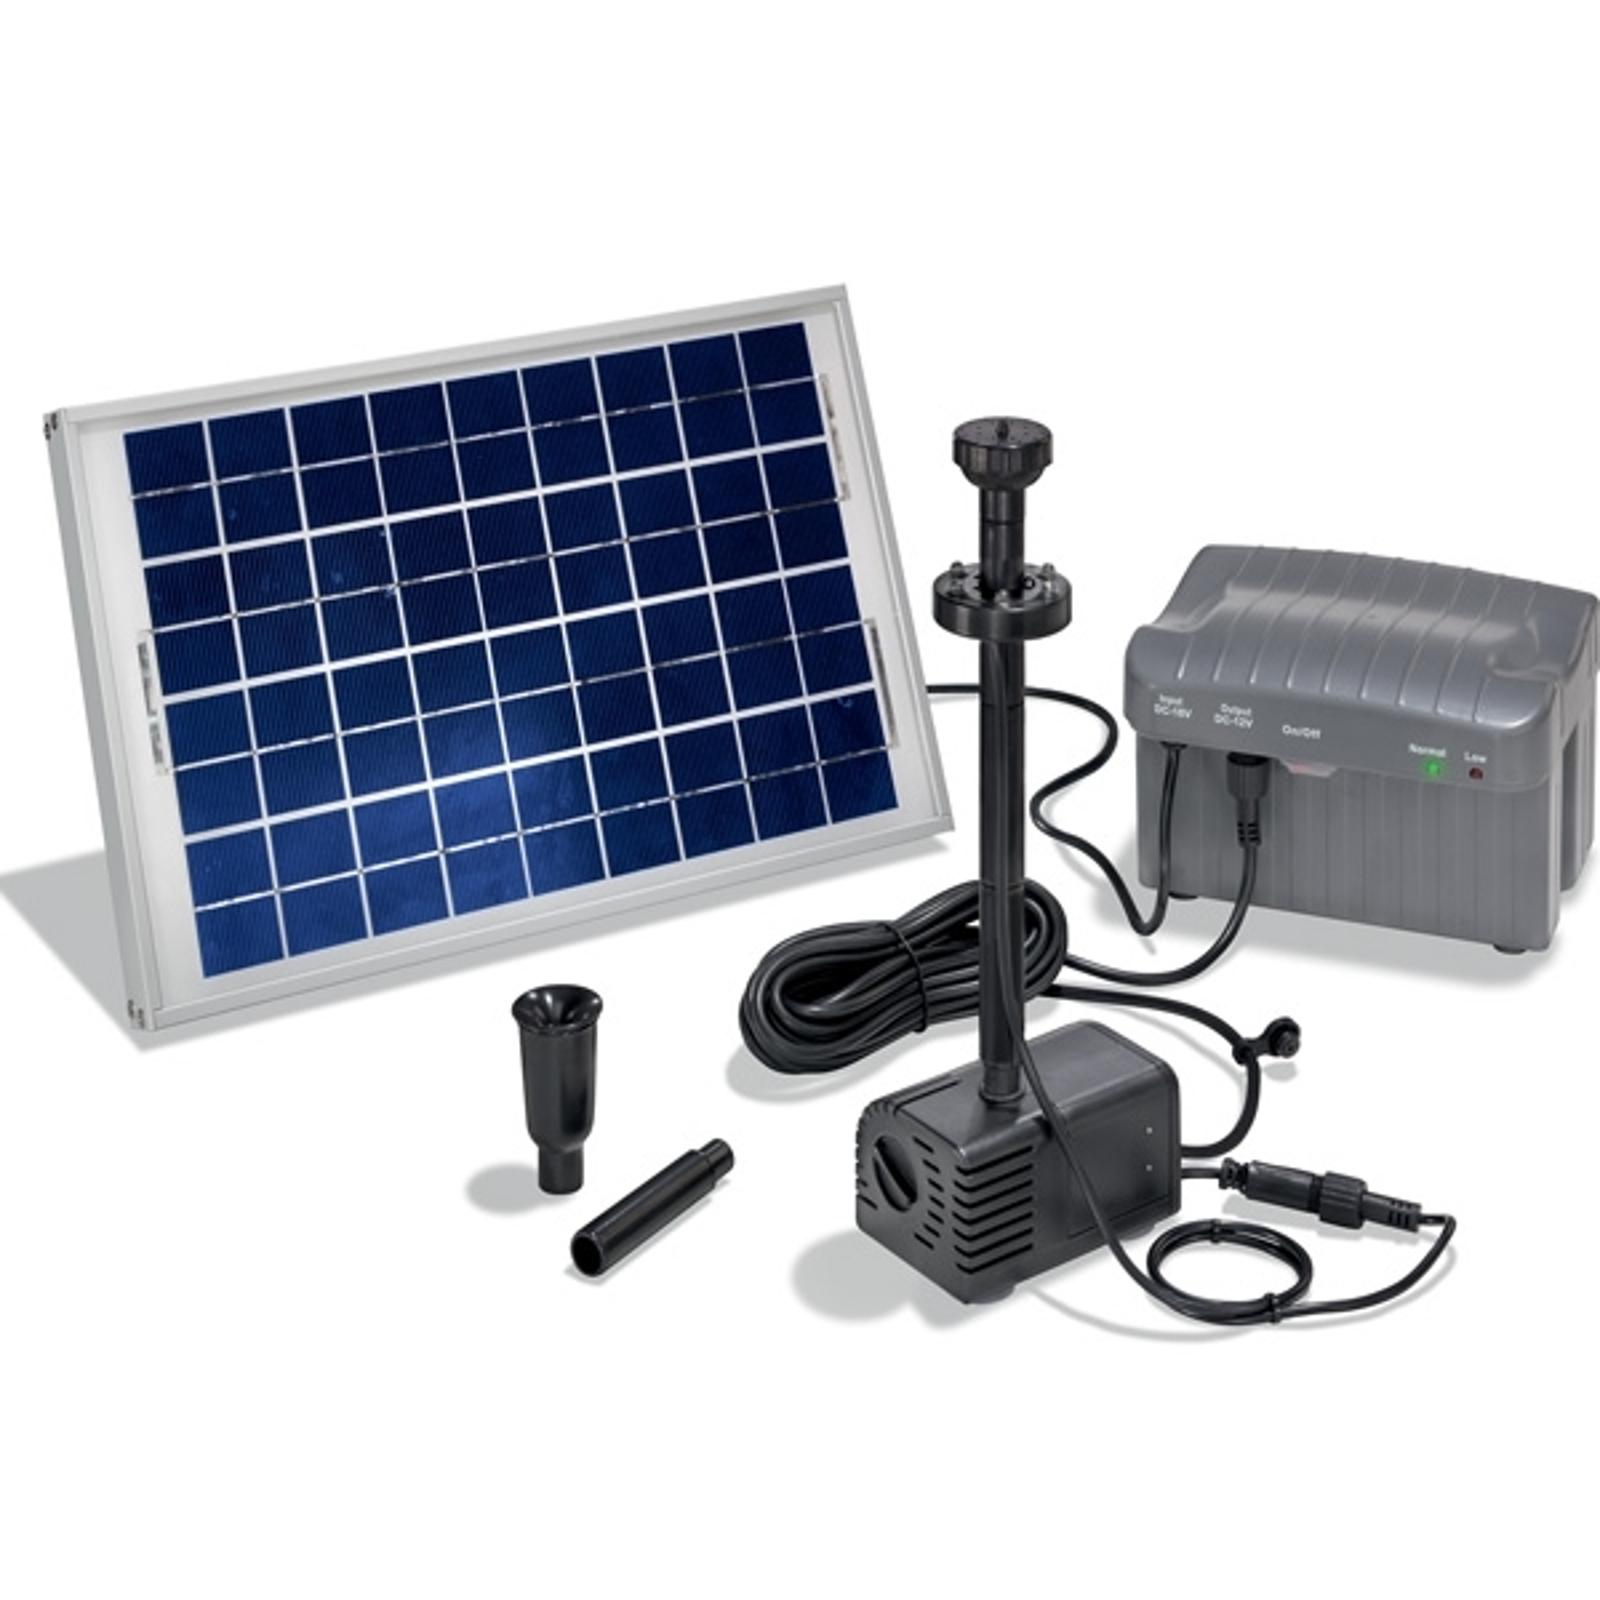 Pompsysteem Napoli met led, op zonne-energie